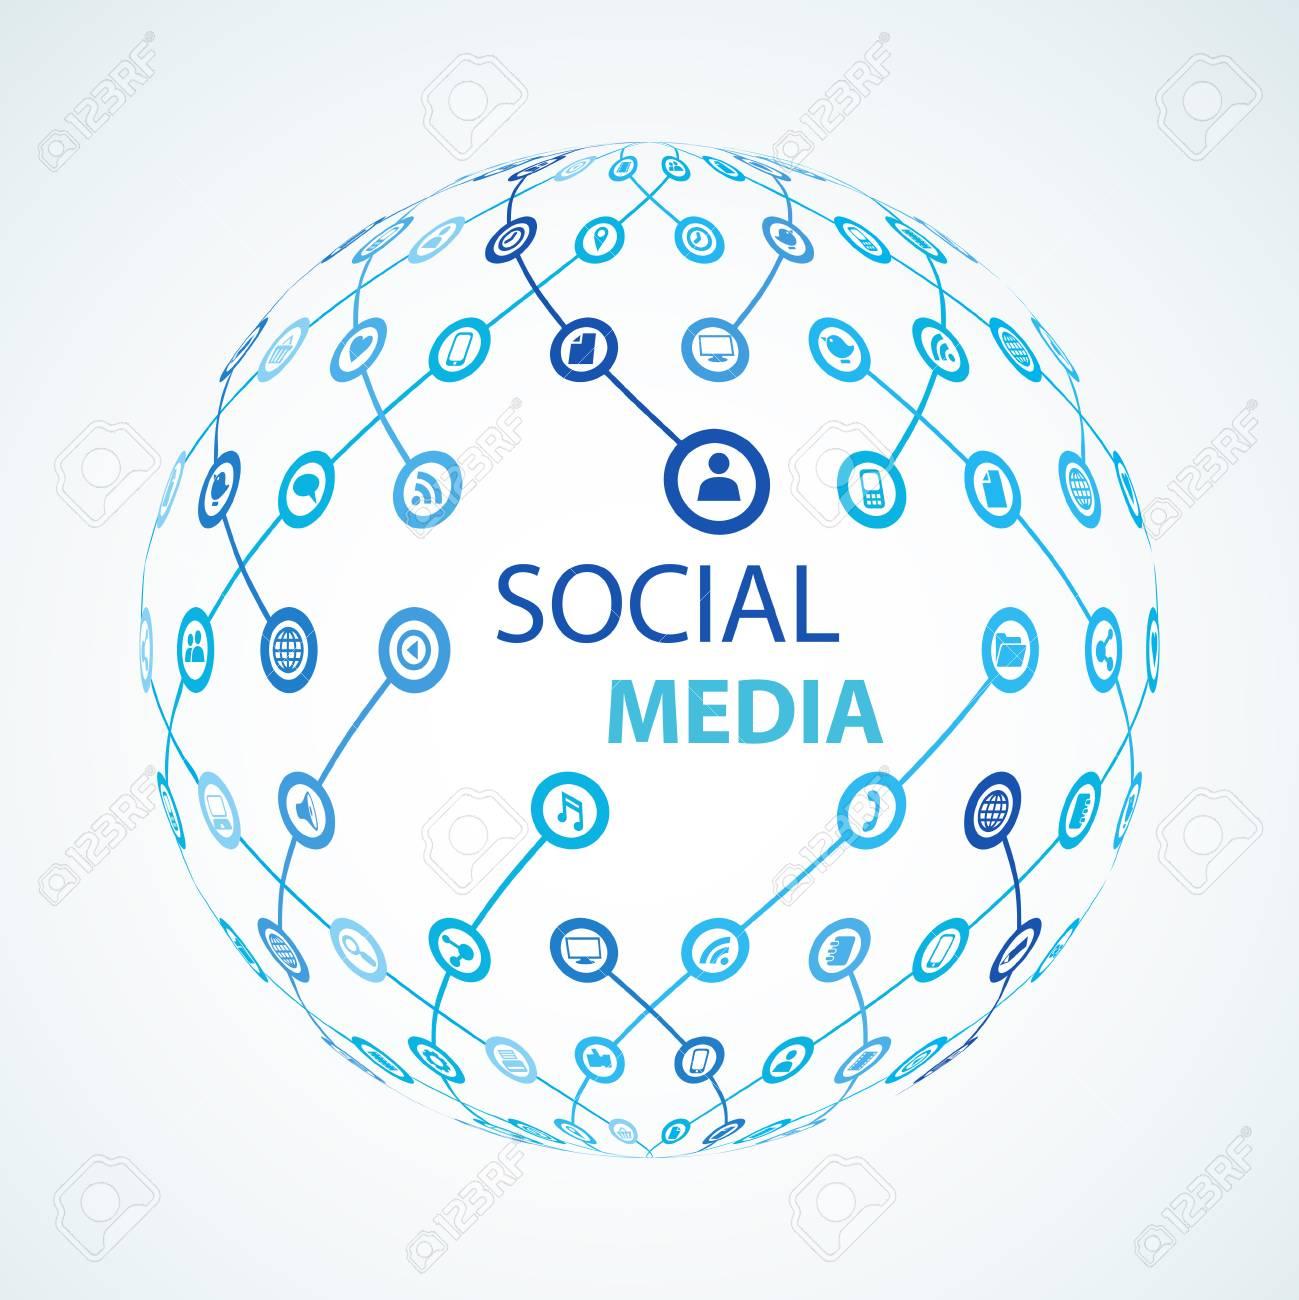 social media element icon sphere worldwide - 55381057